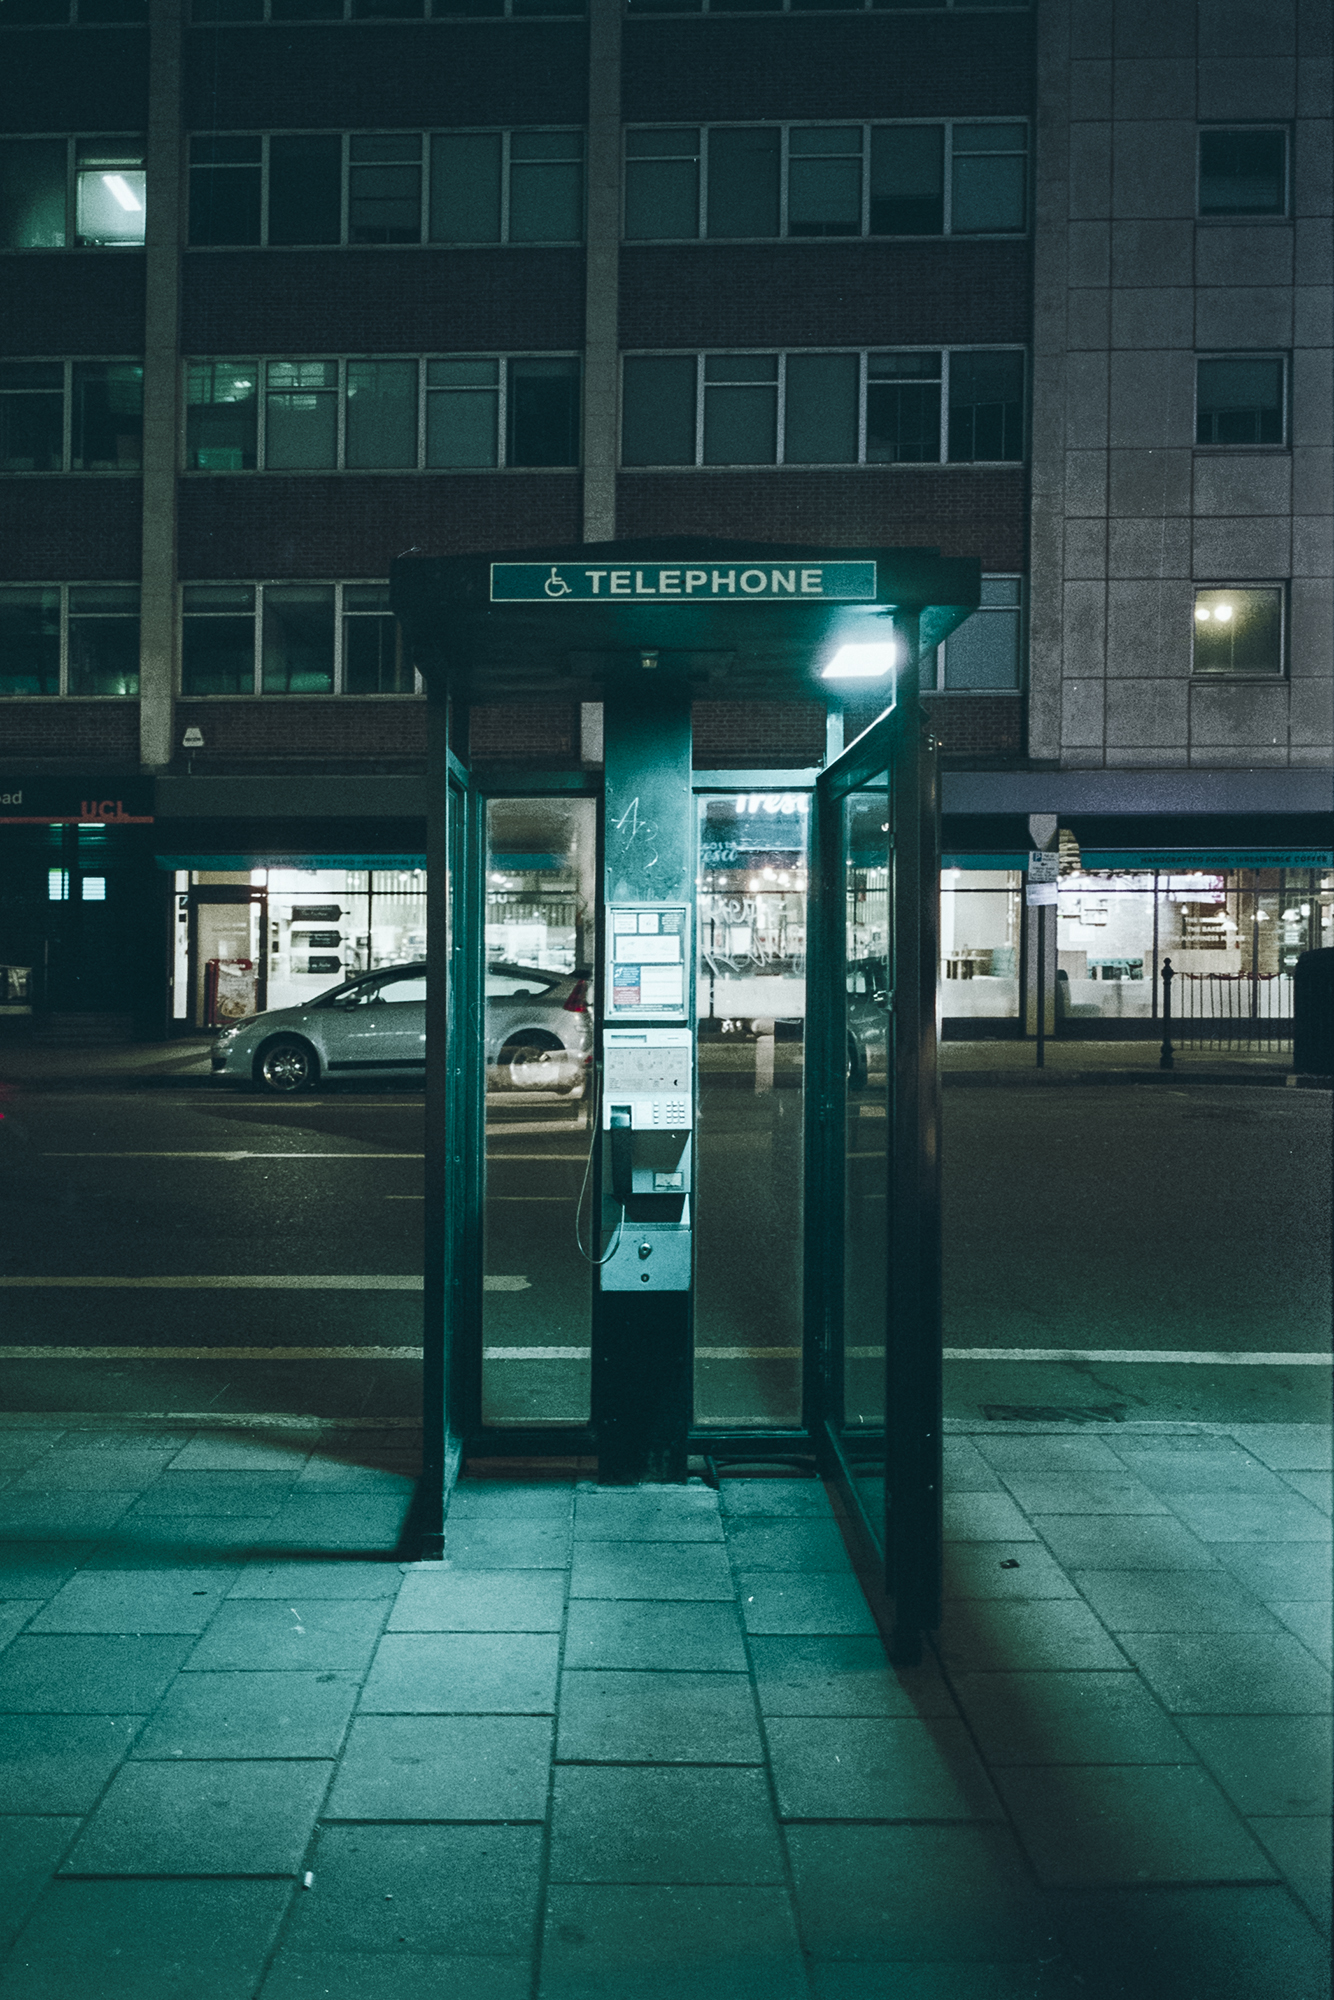 Oscar-arribas-photography-fotografo-portrait-retrato-editorial-london-street-photography-urbana-londres-film-analog-35mm-night-nocturna-61.jpg